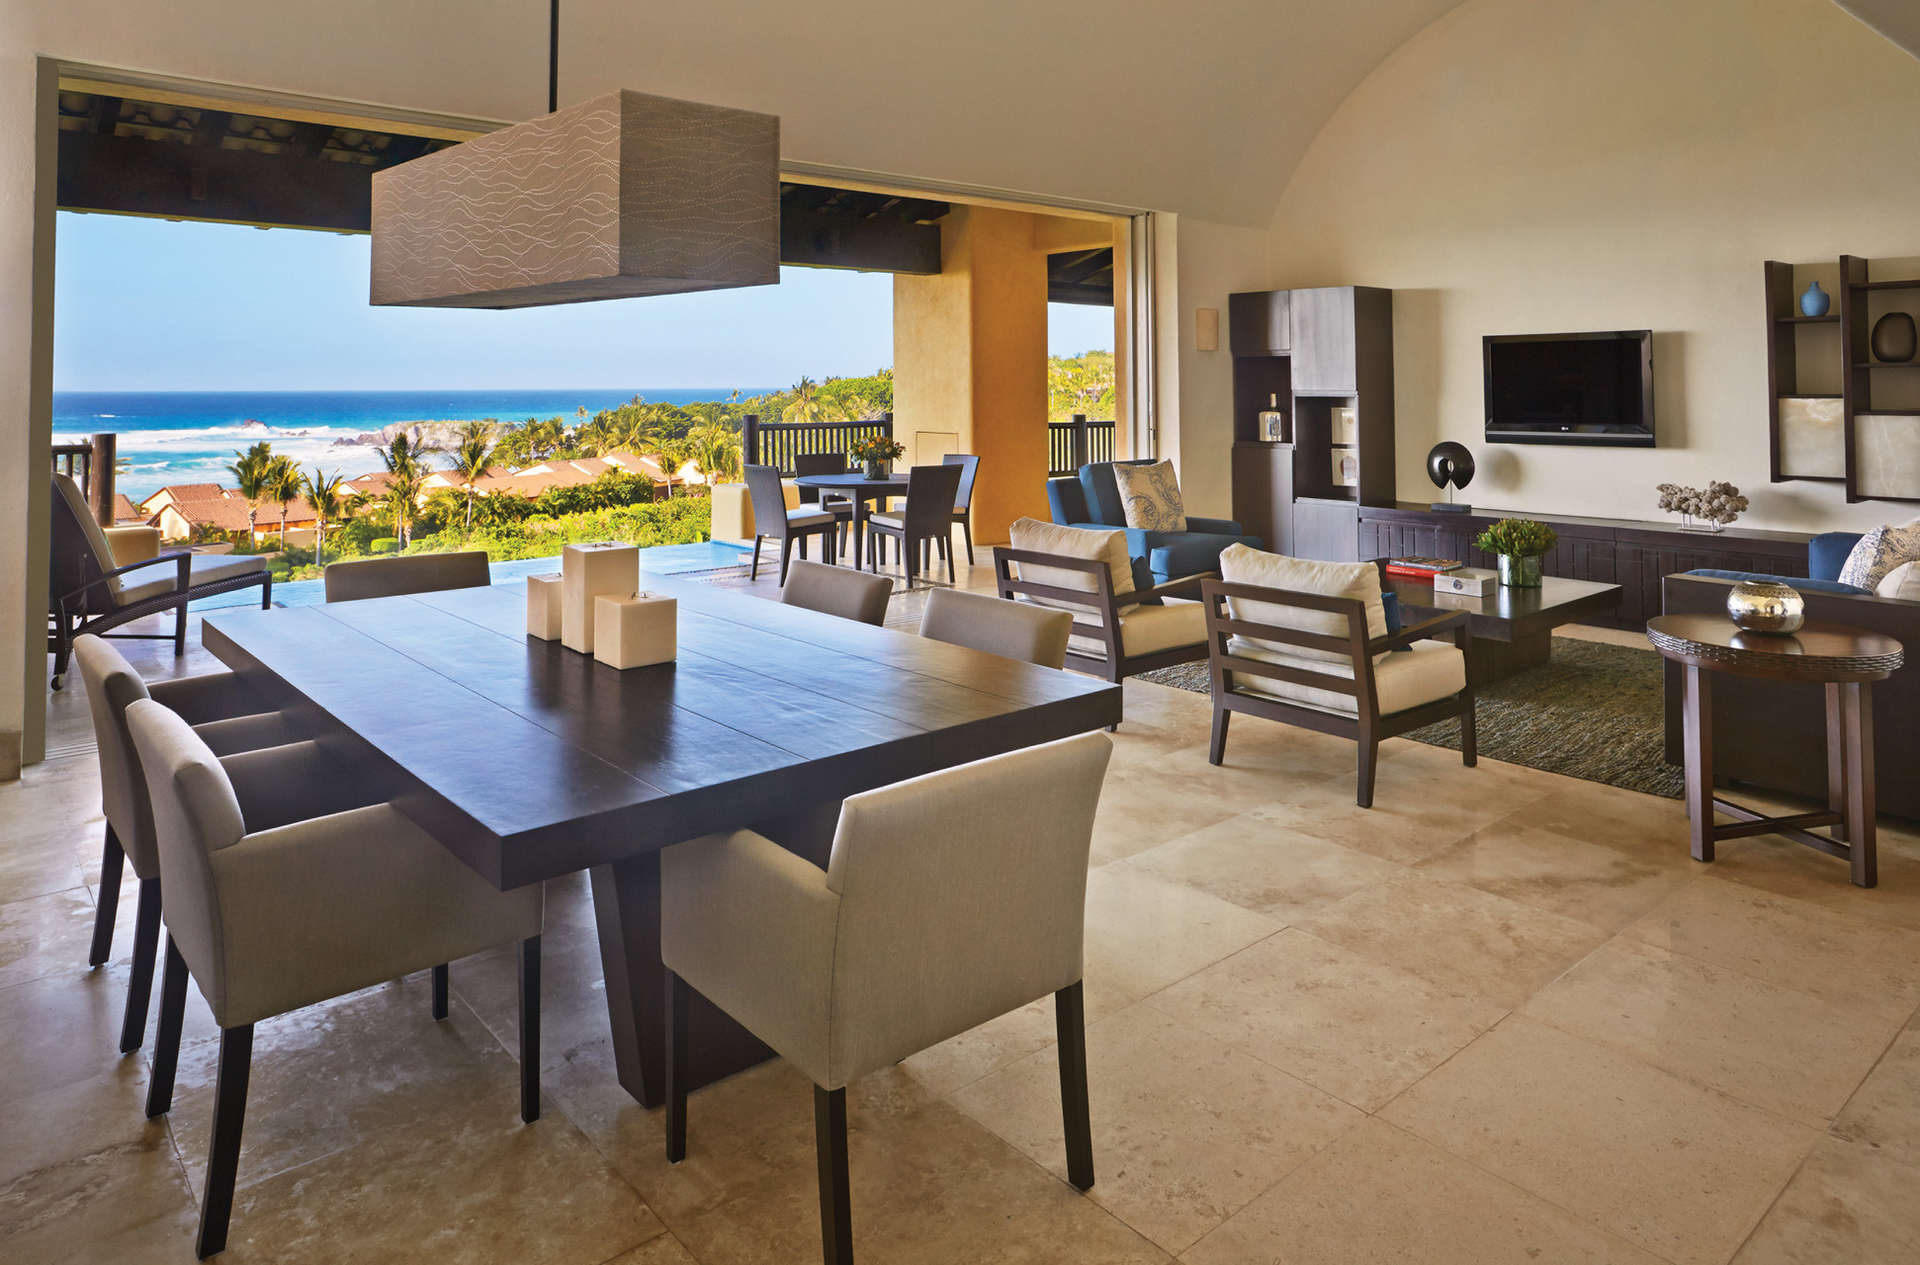 Luxury vacation rentals mexico - Punta mita - Four seasons punta mita - Penthouse Ocean View 4 BRM - Image 1/5